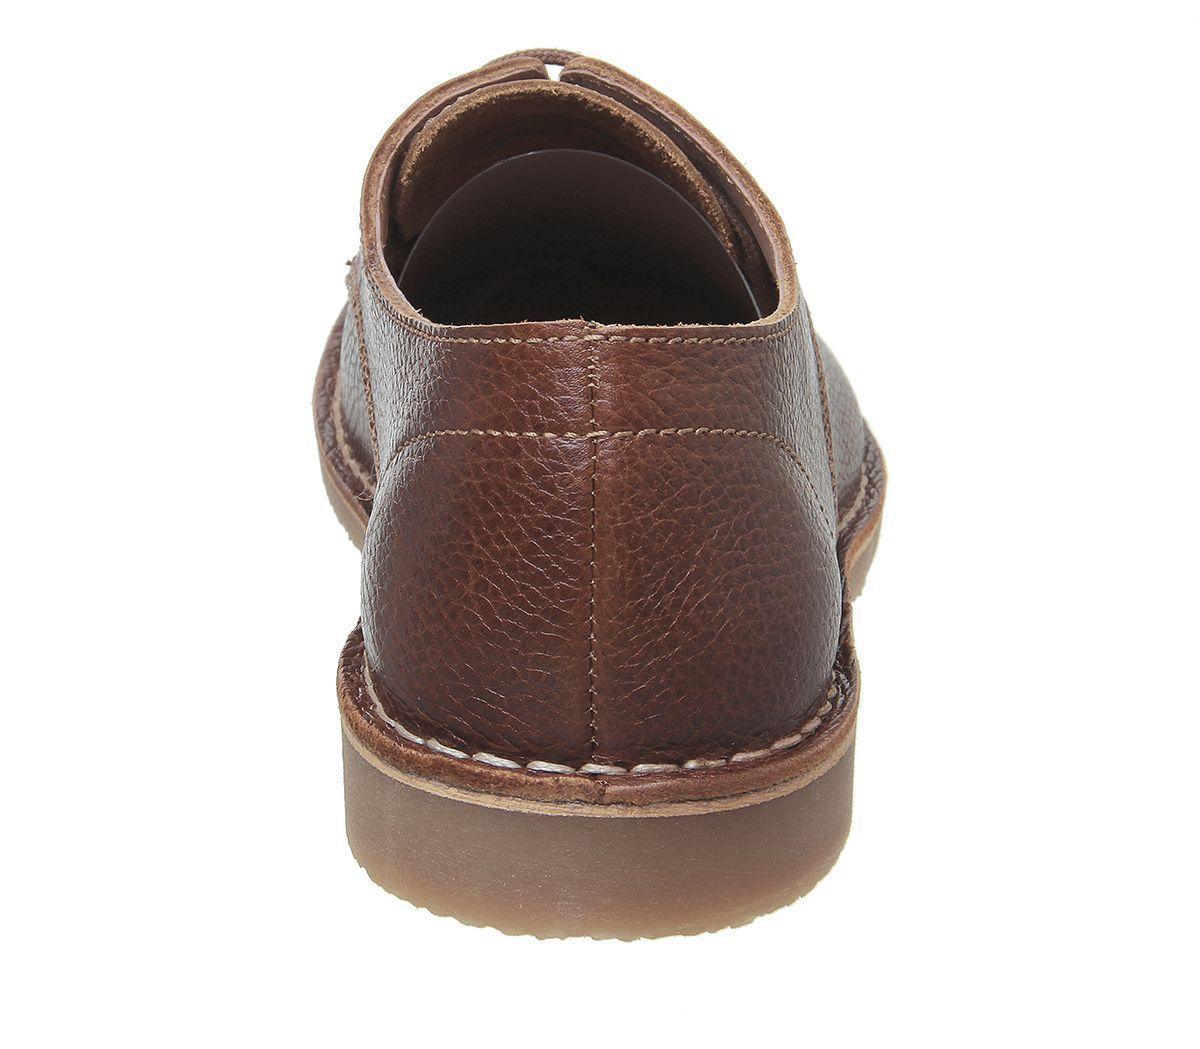 Da-Uomo-Ufficio-Celsius-Scarpe-DESERT-Tan-in-Pelle-Casual-Scarpe miniatura 4